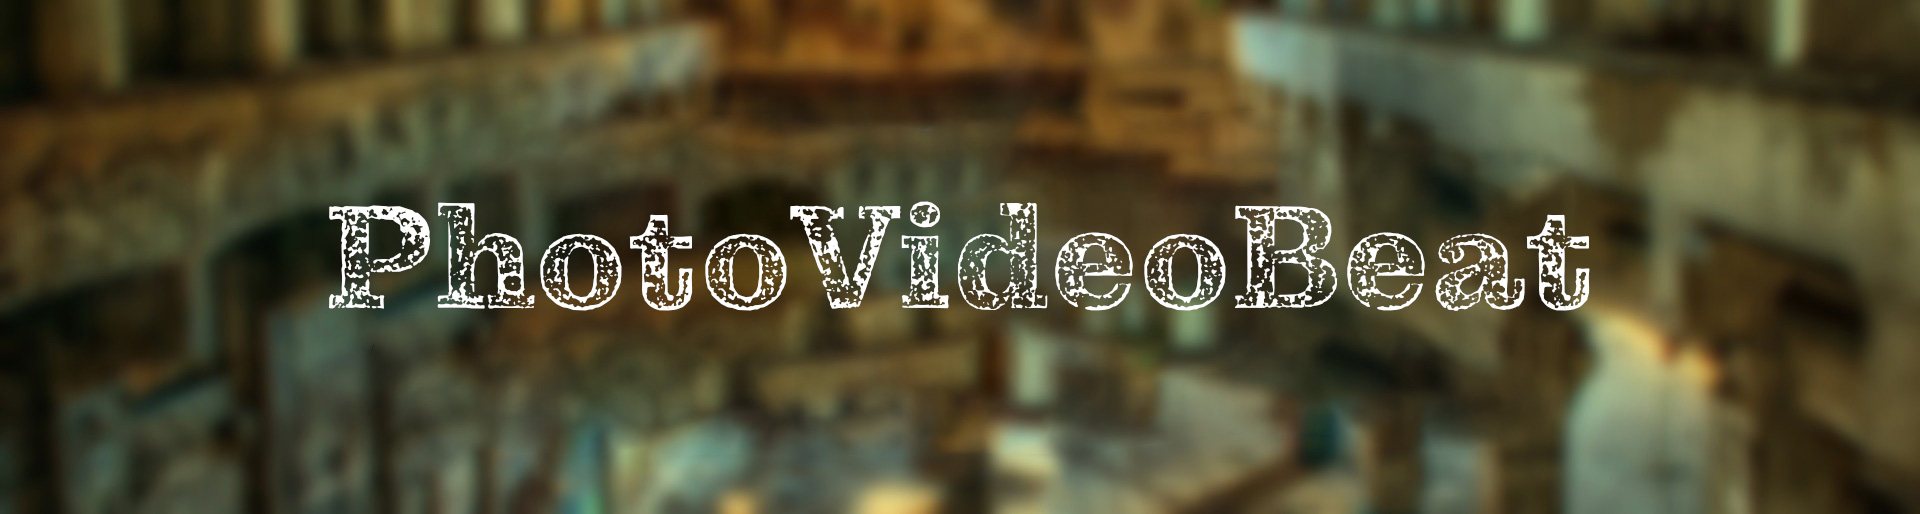 PhotoVideoBeat